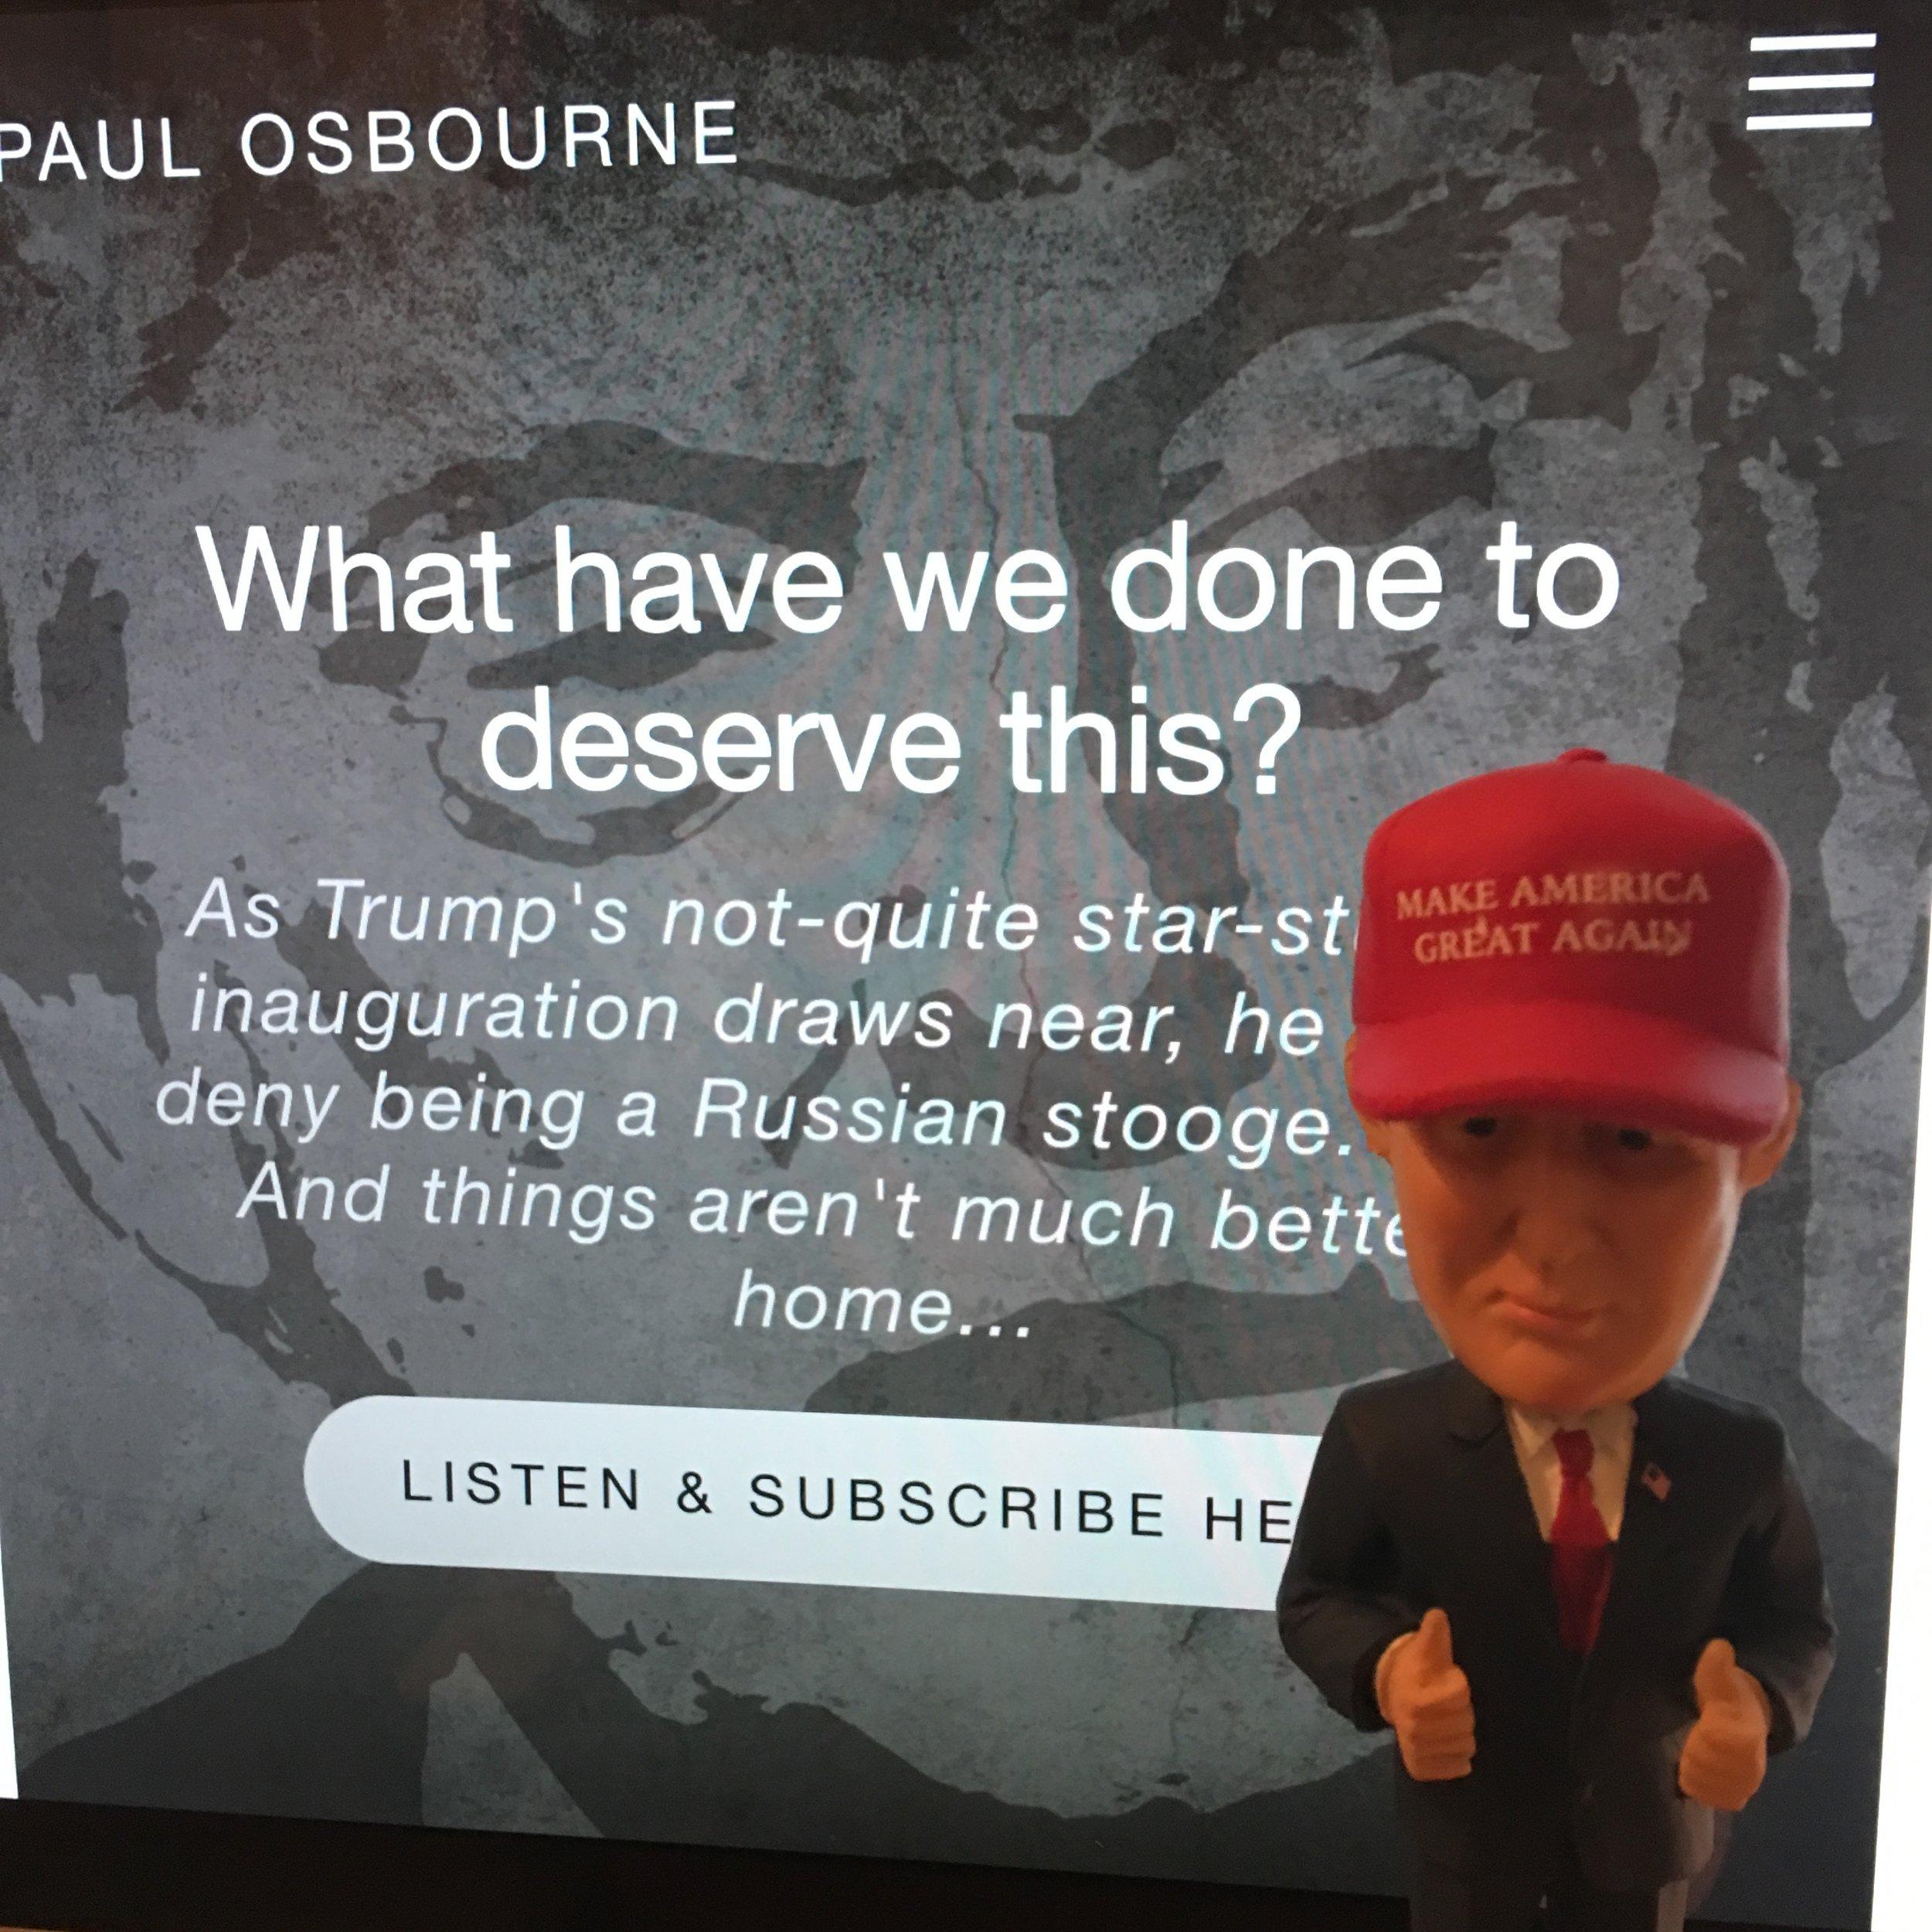 Donald Trump endorses the podcast. Kind of.